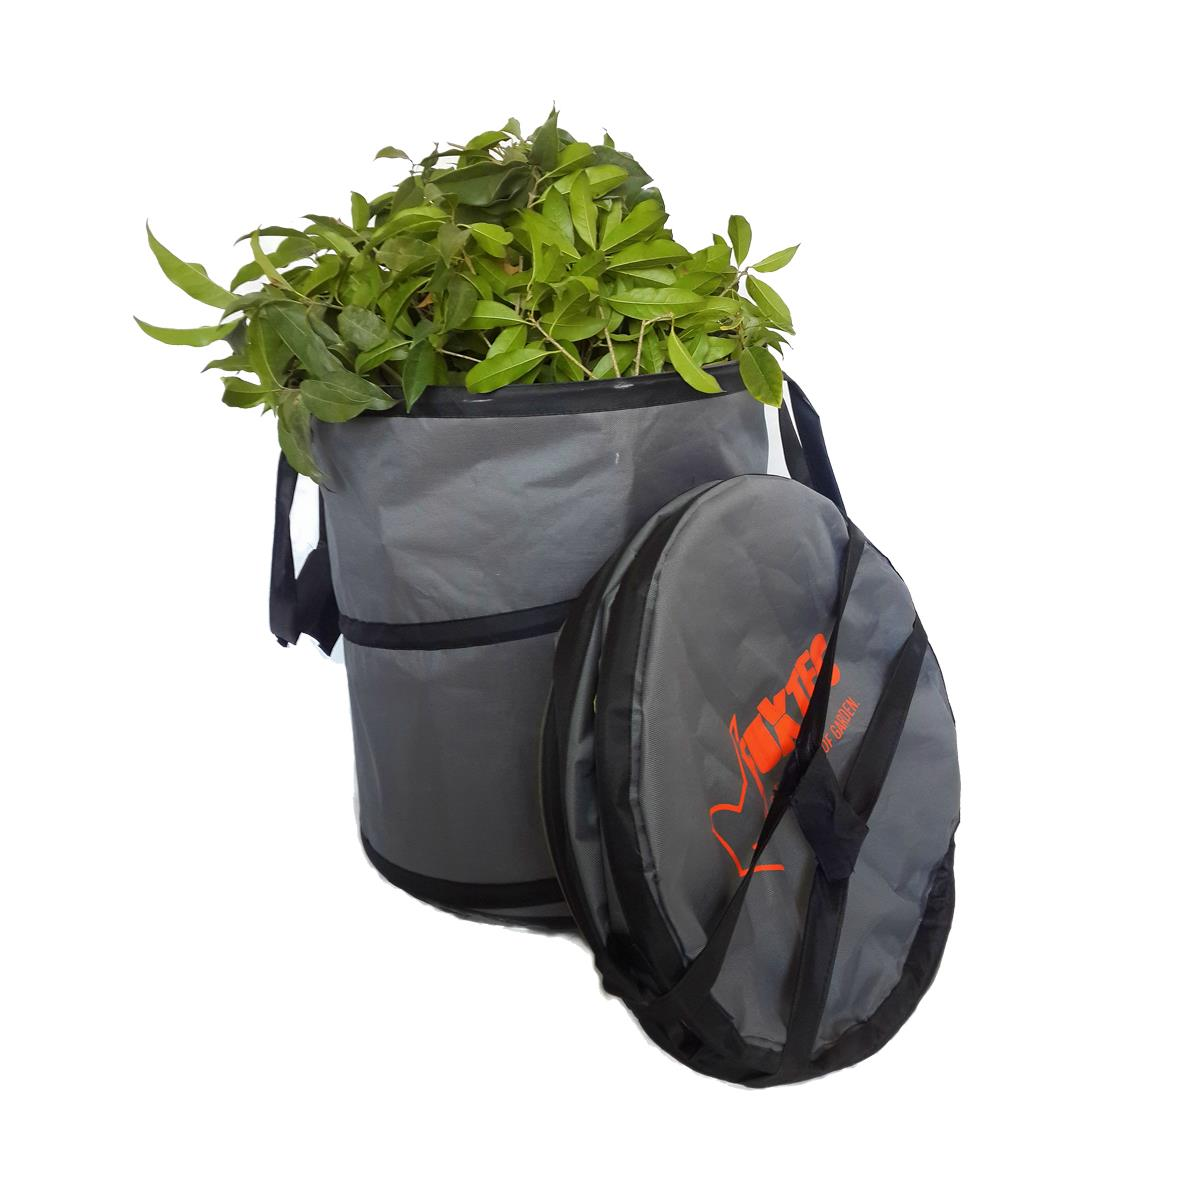 FUXTEC Gartenabfallbehälter FX-GB100 6er Set